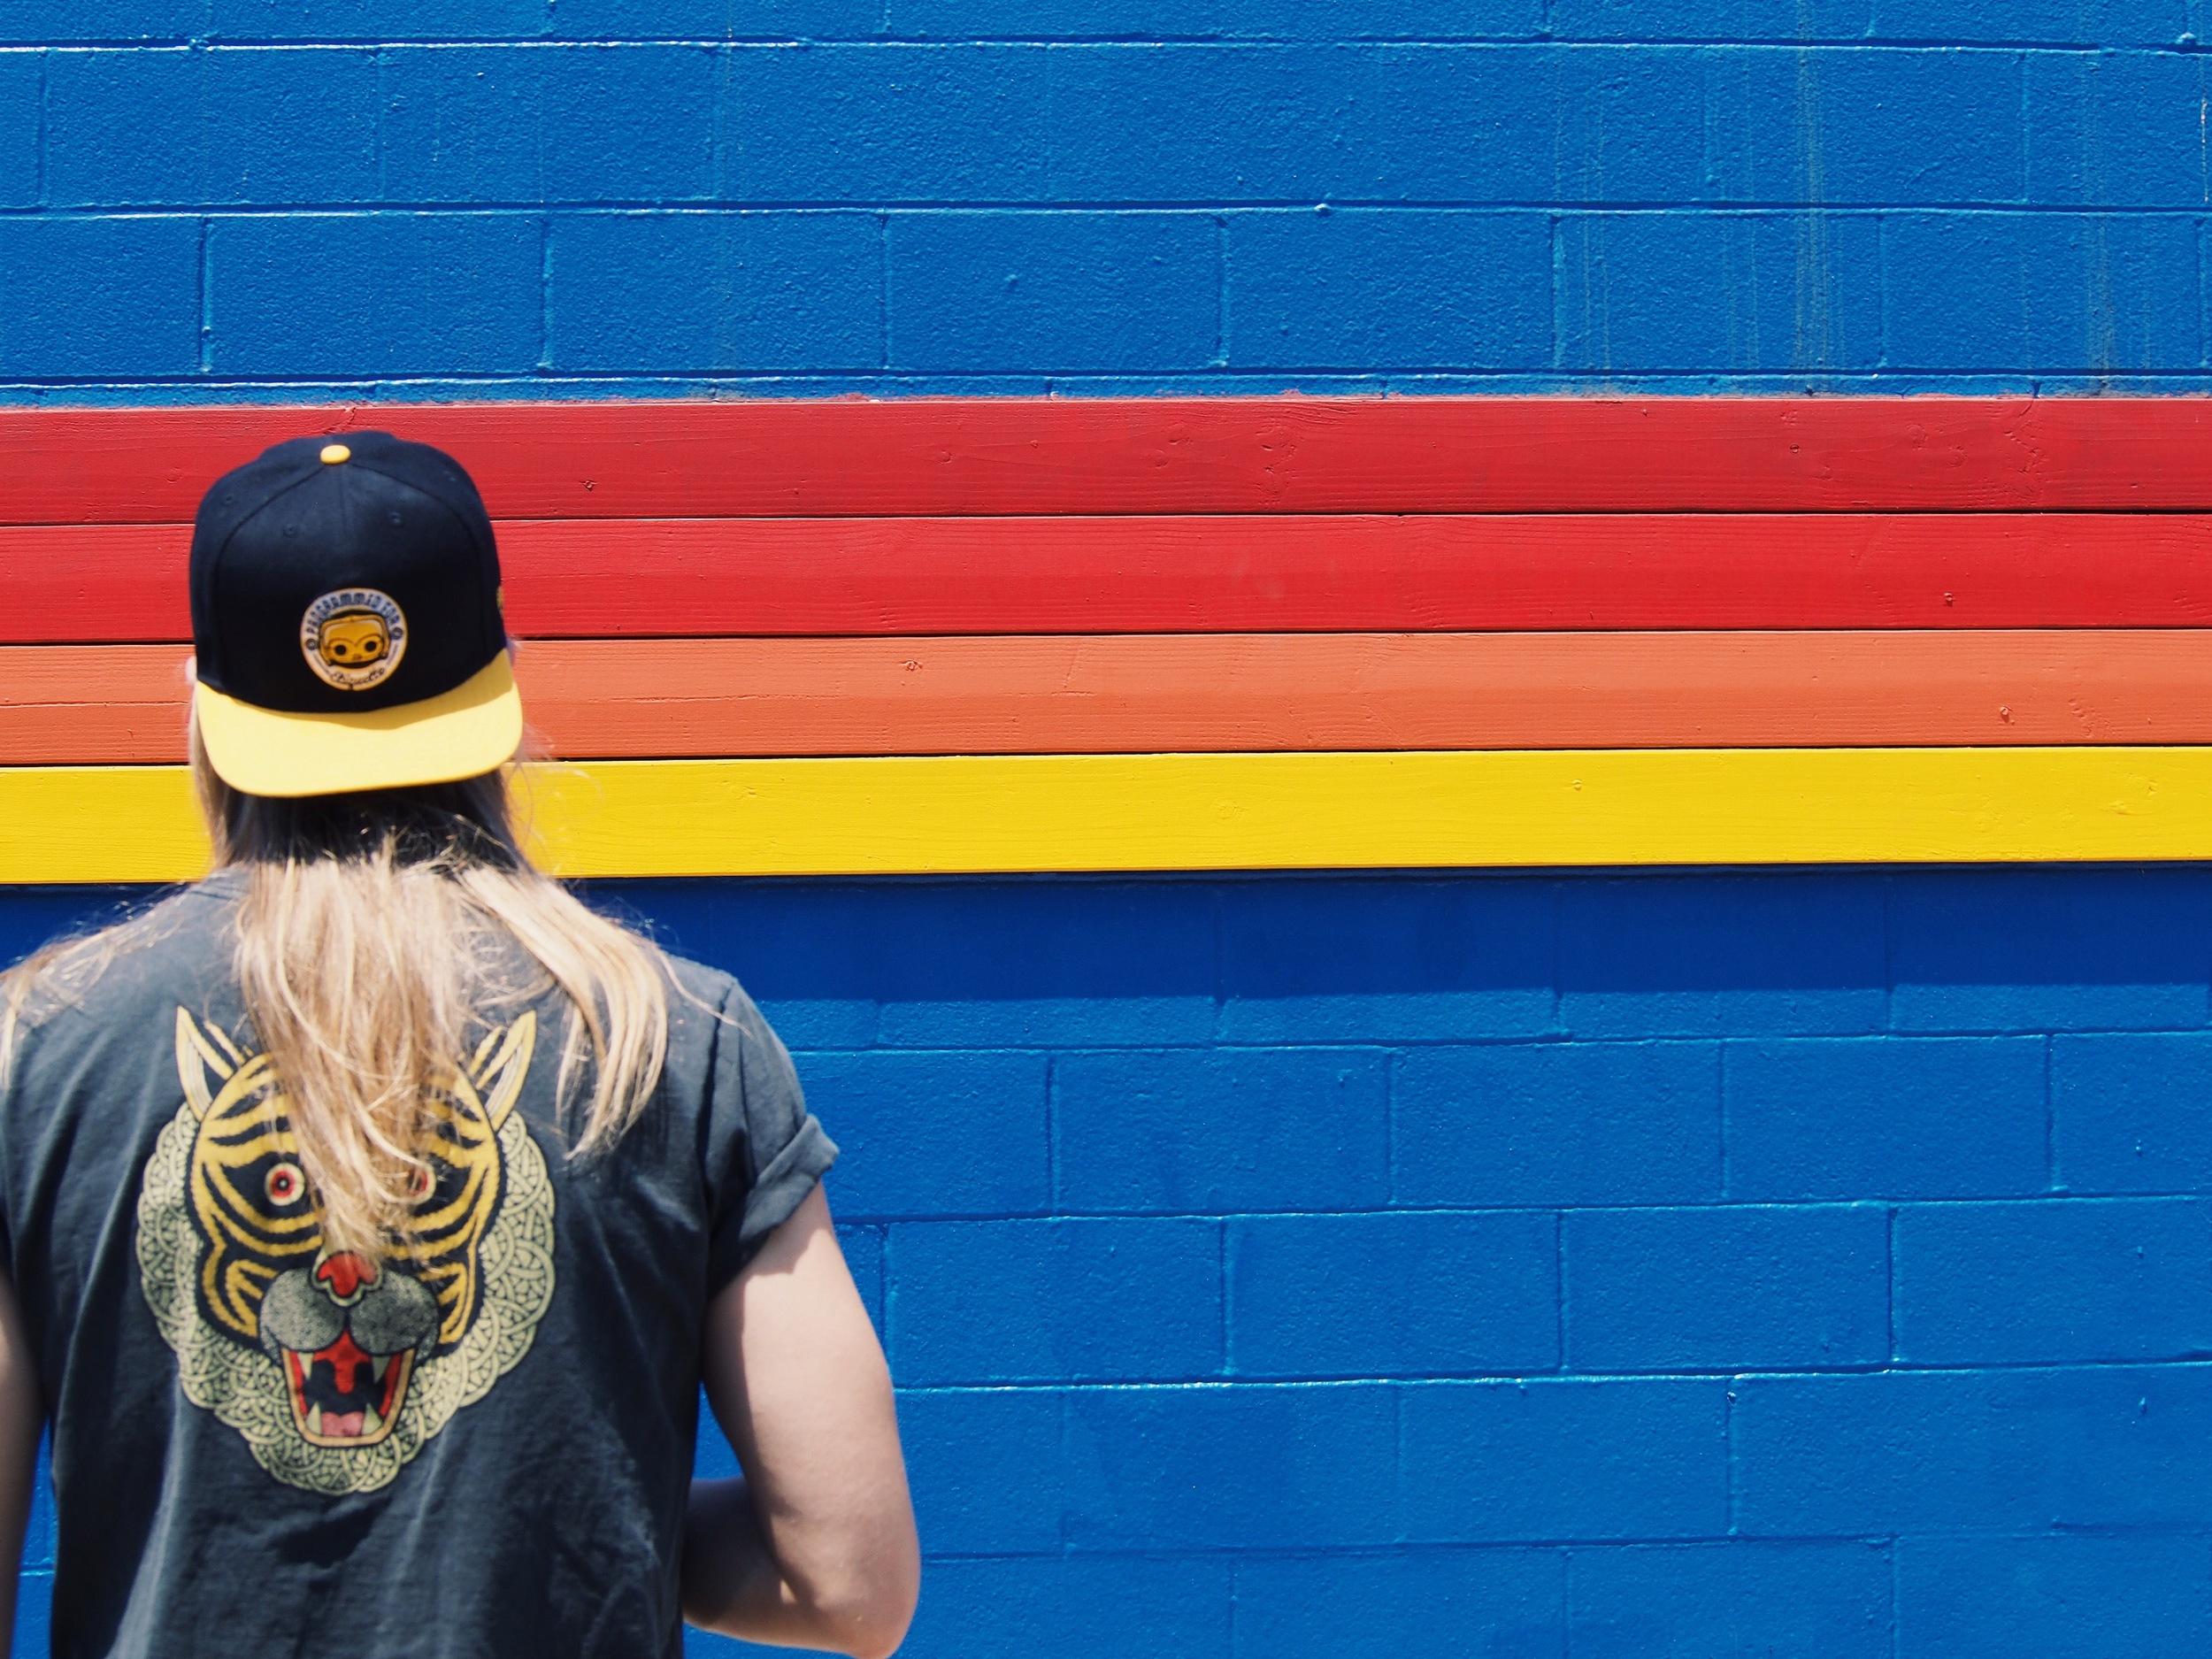 Shirt: Obey. Hat: Pop Funko.